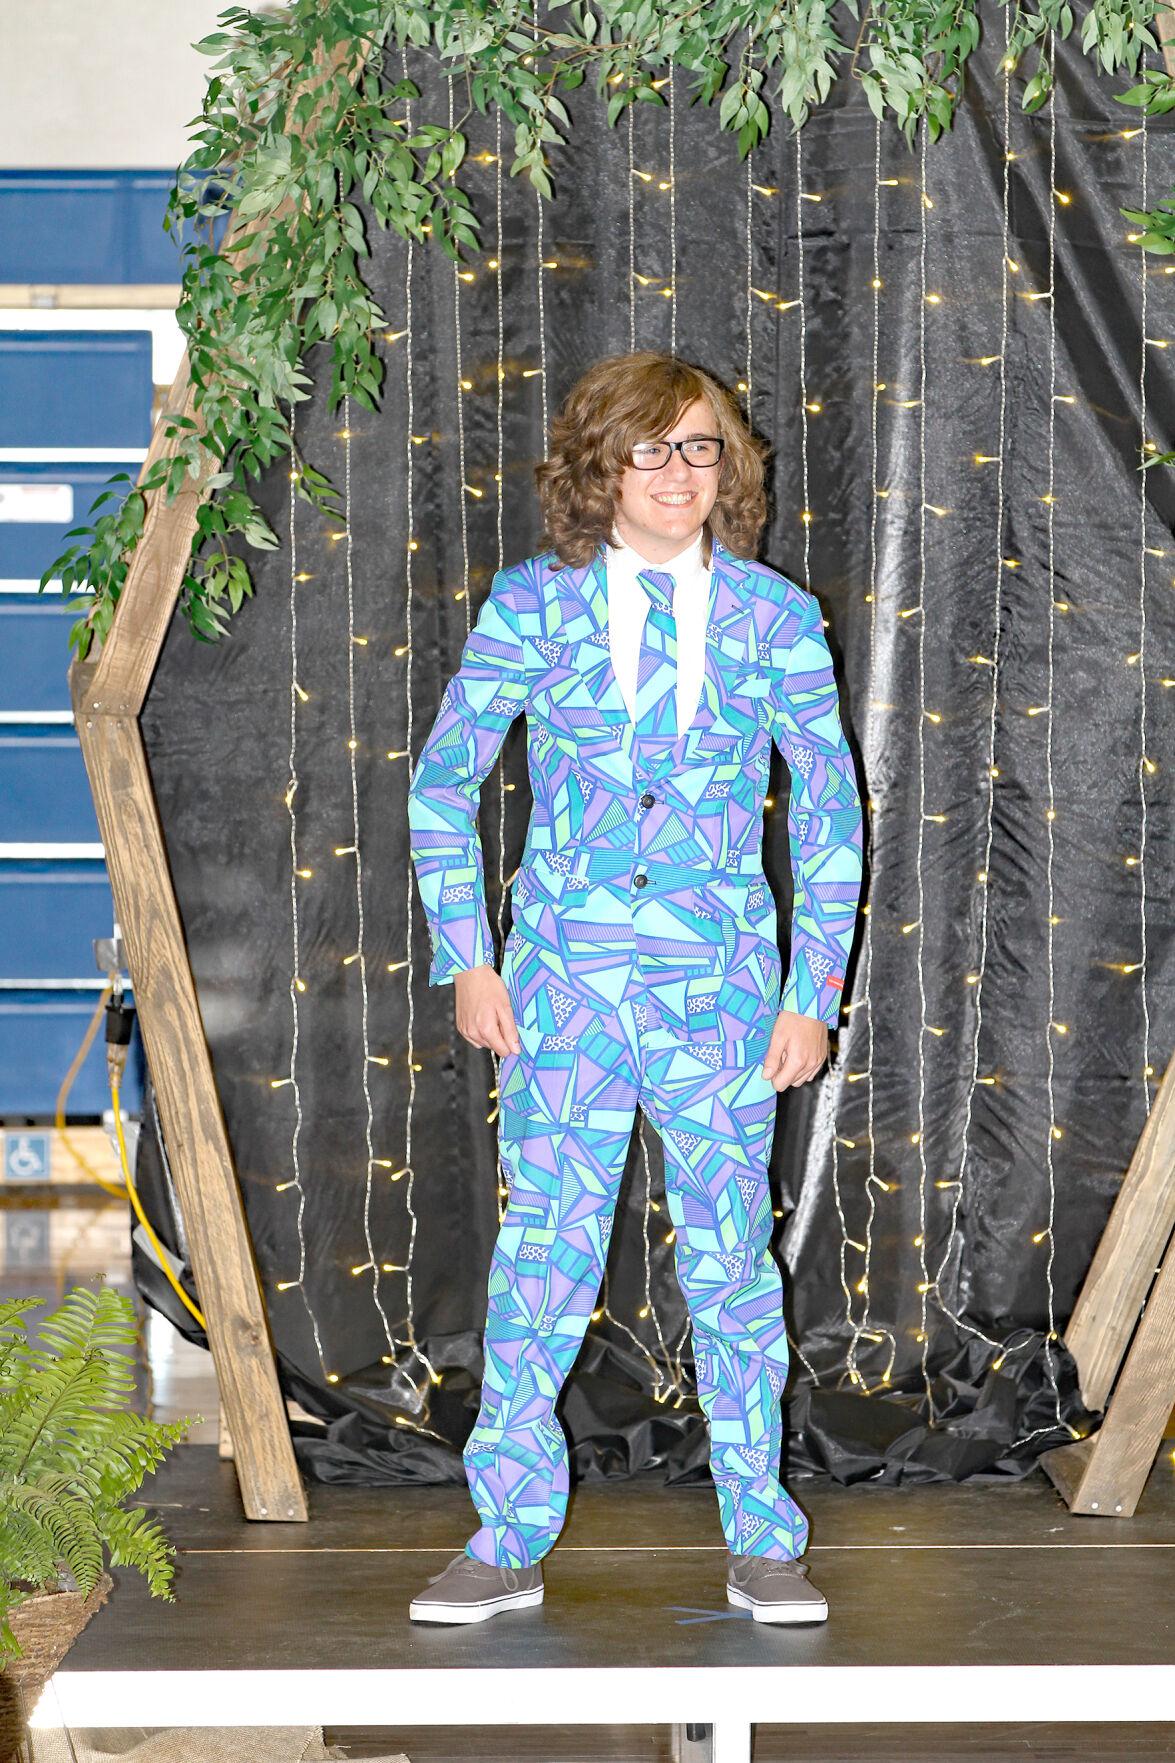 Moose Lake High School celebrates prom